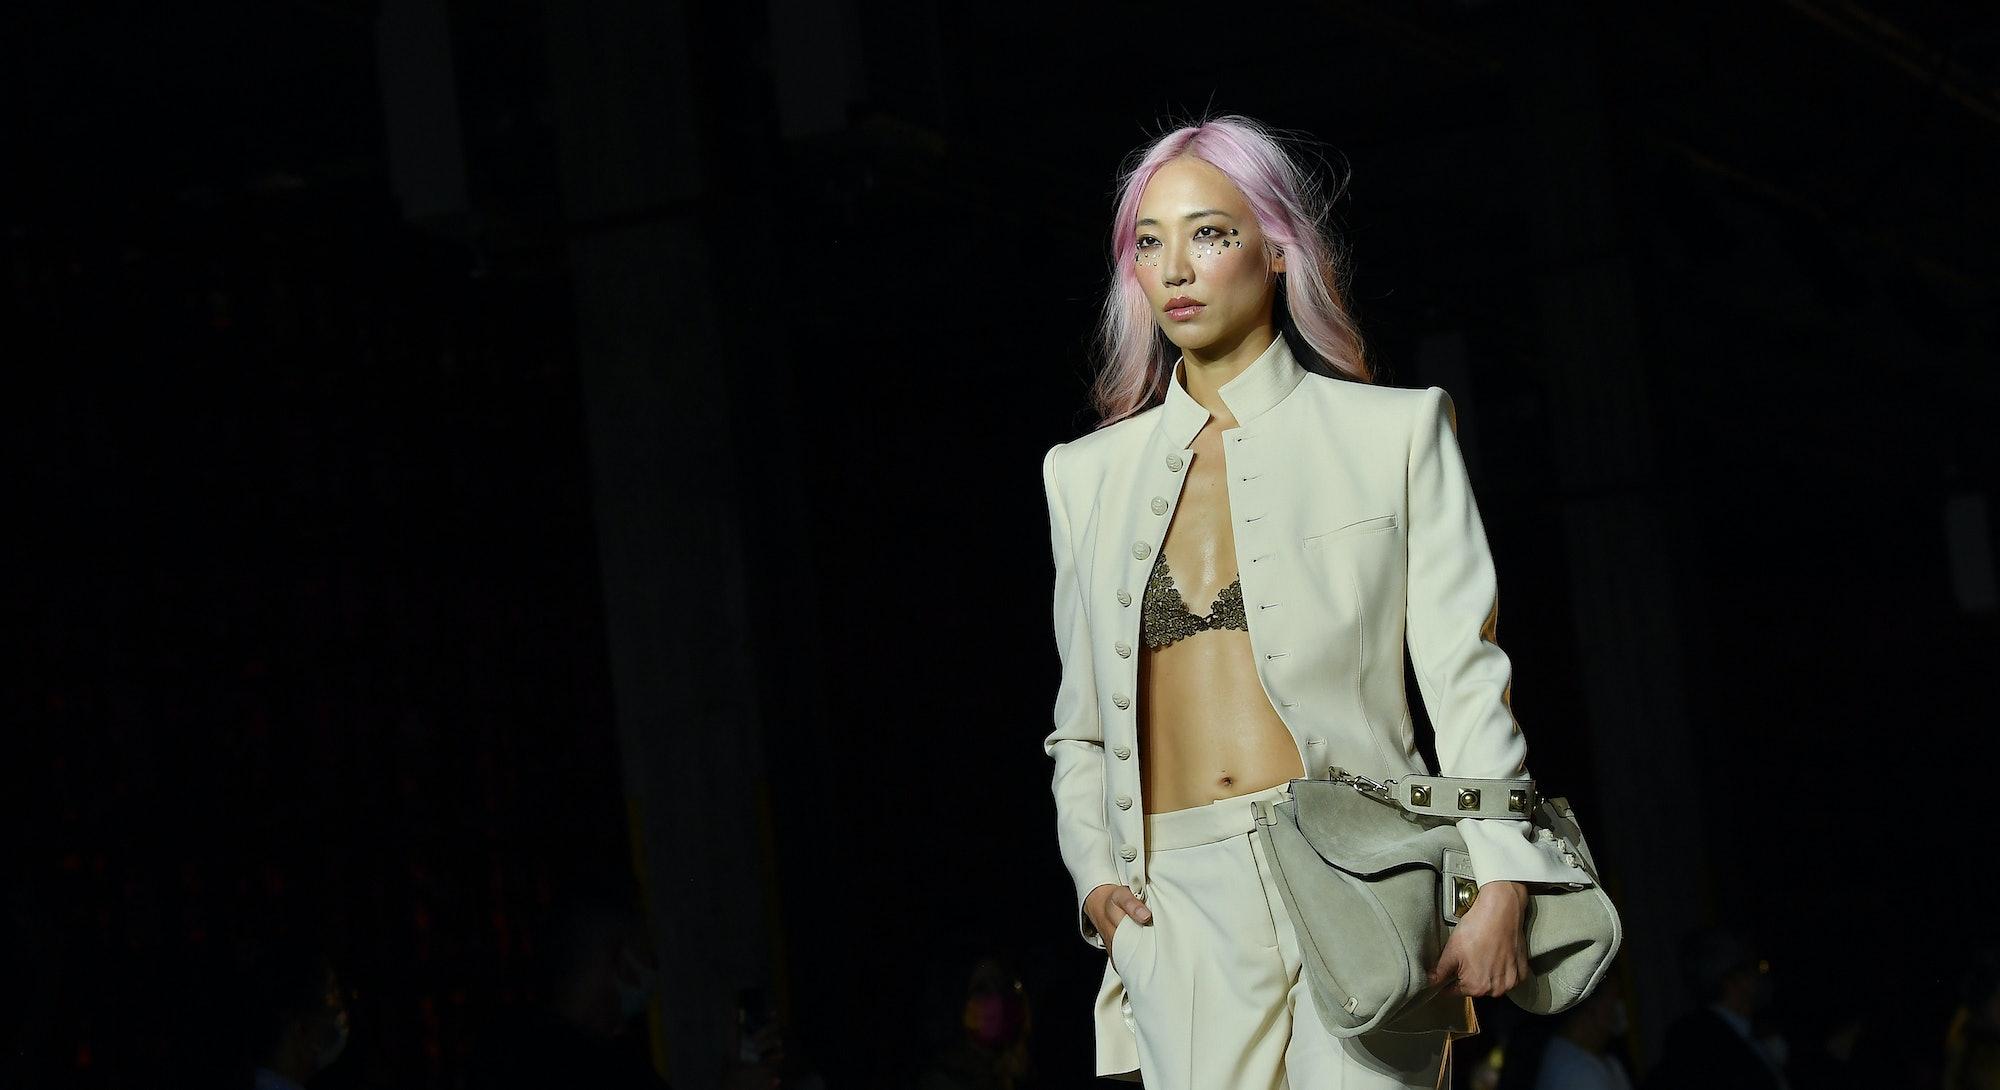 Soo Joo walks the runway at the Etro Spring 2022 fashion show during the Milan Fashion Week - Sprin...